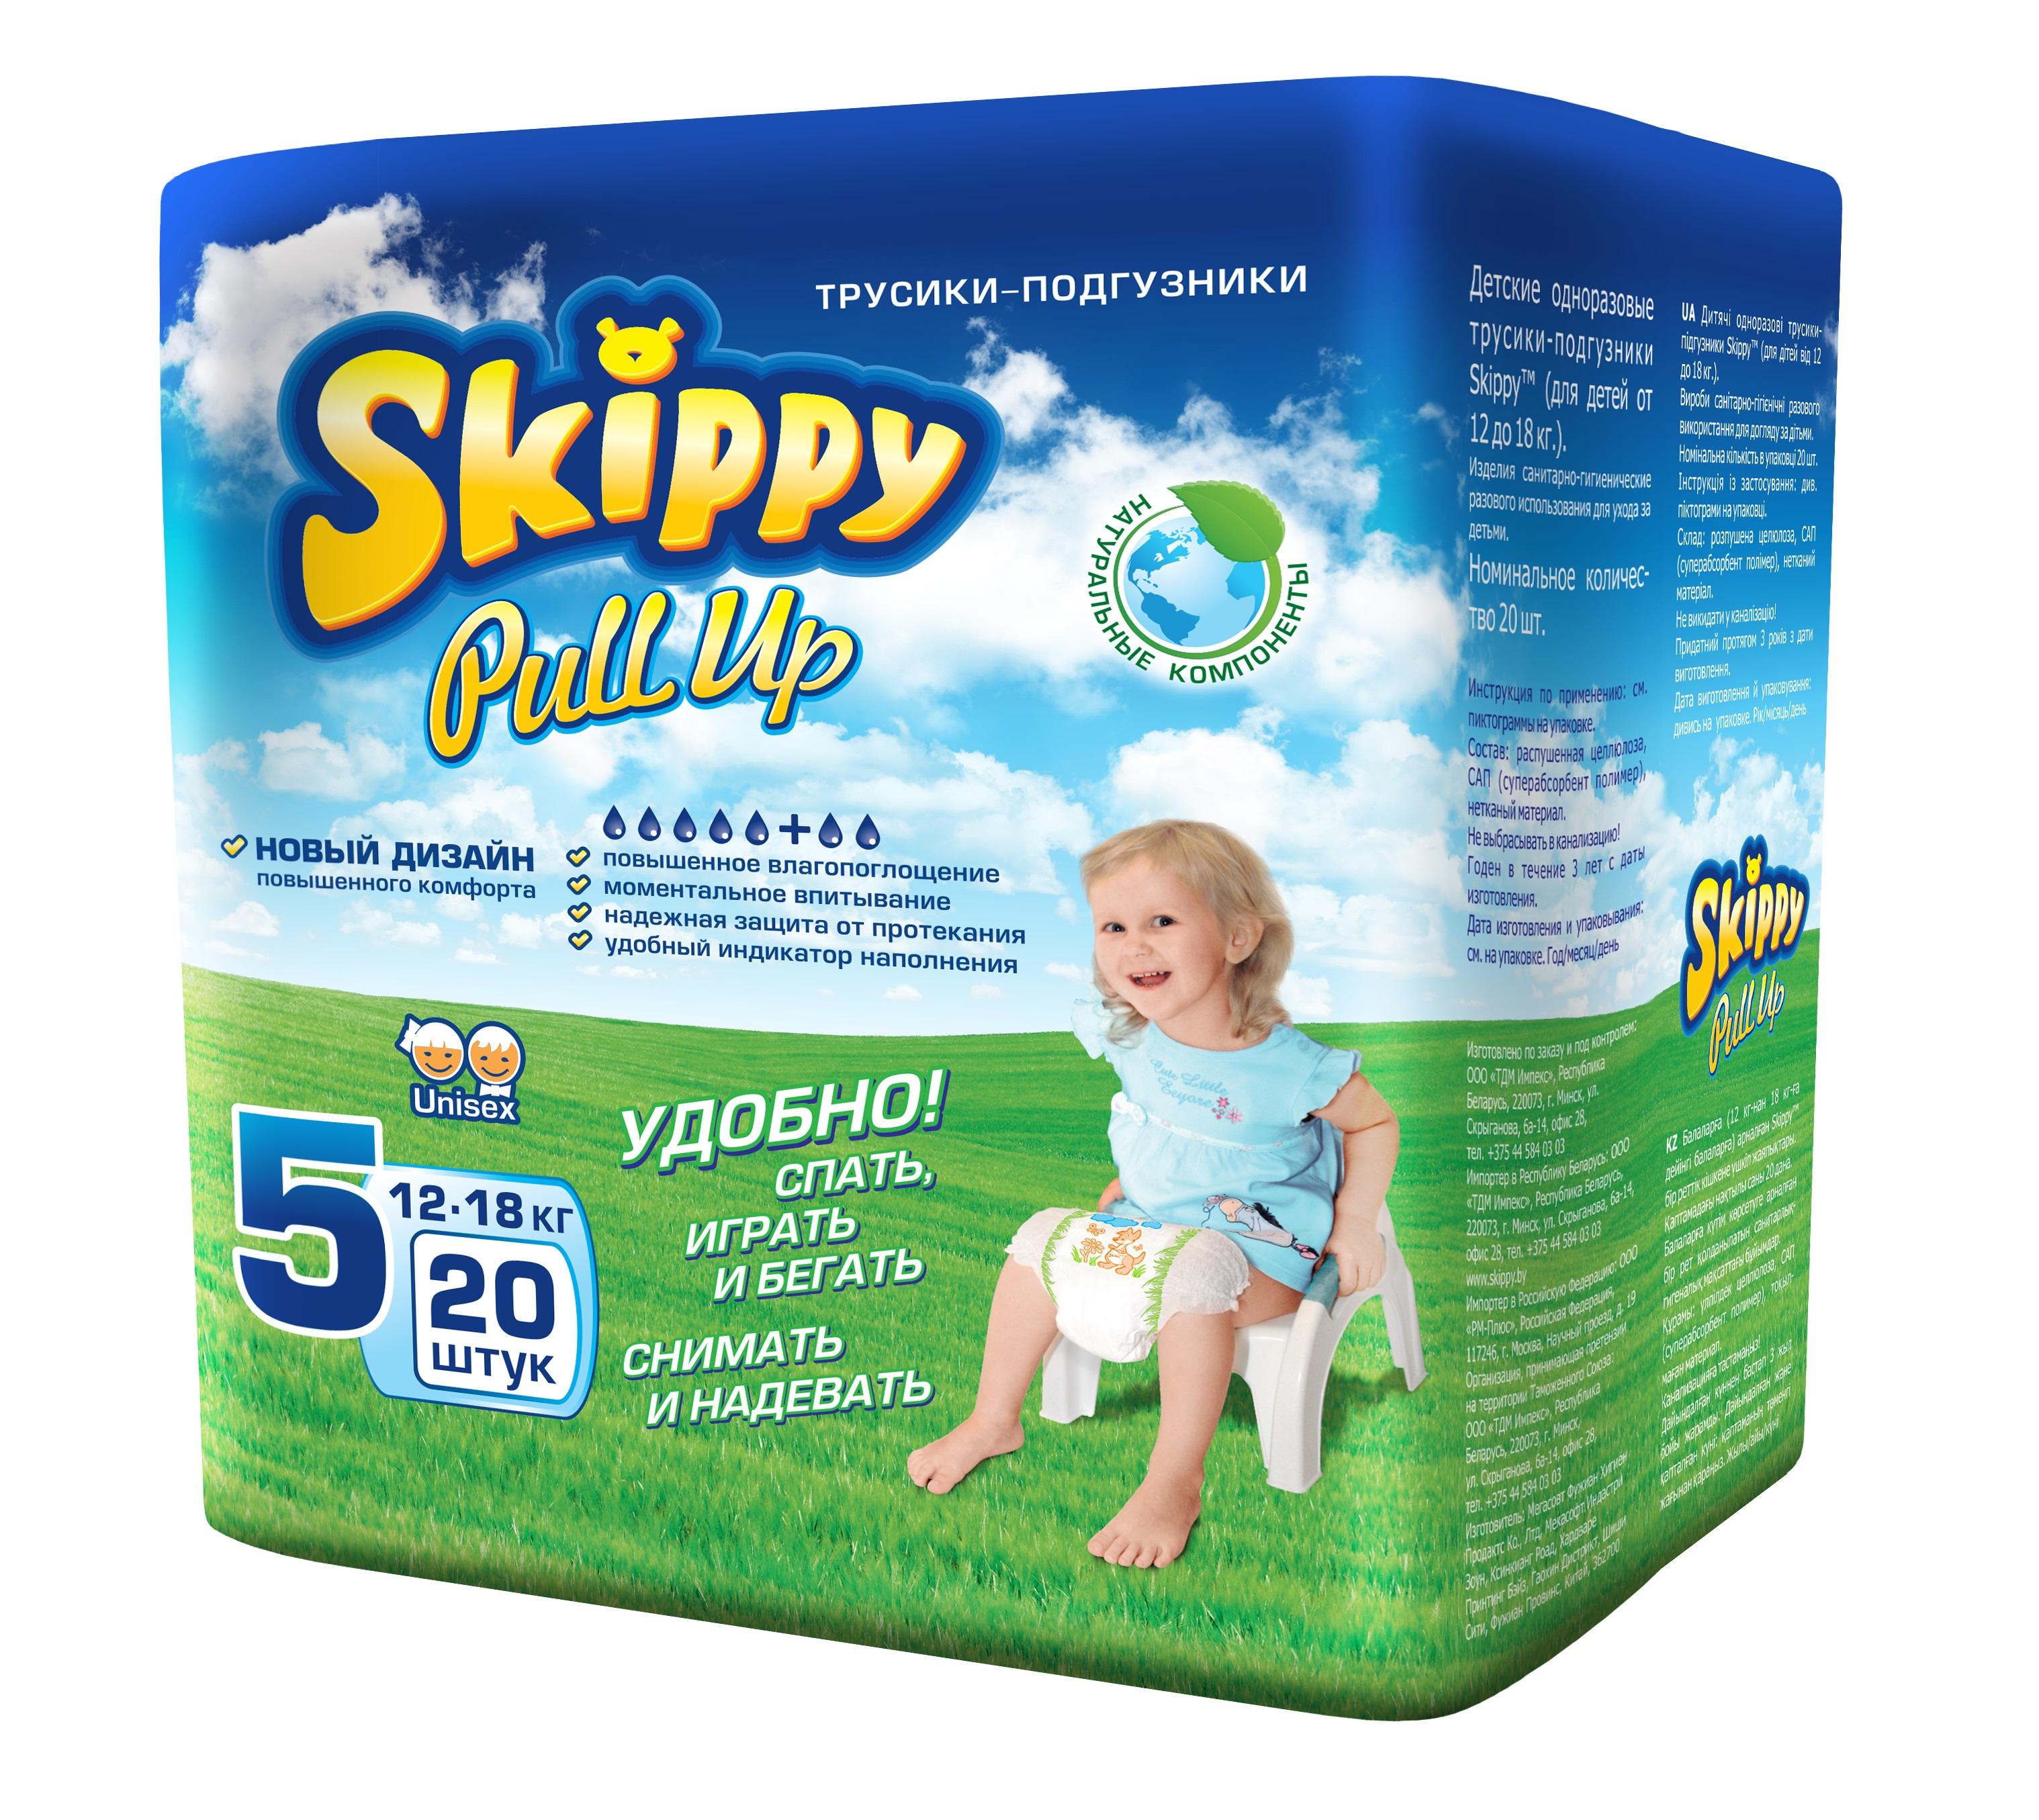 Подгузники трусики Skippy Pull Up р.